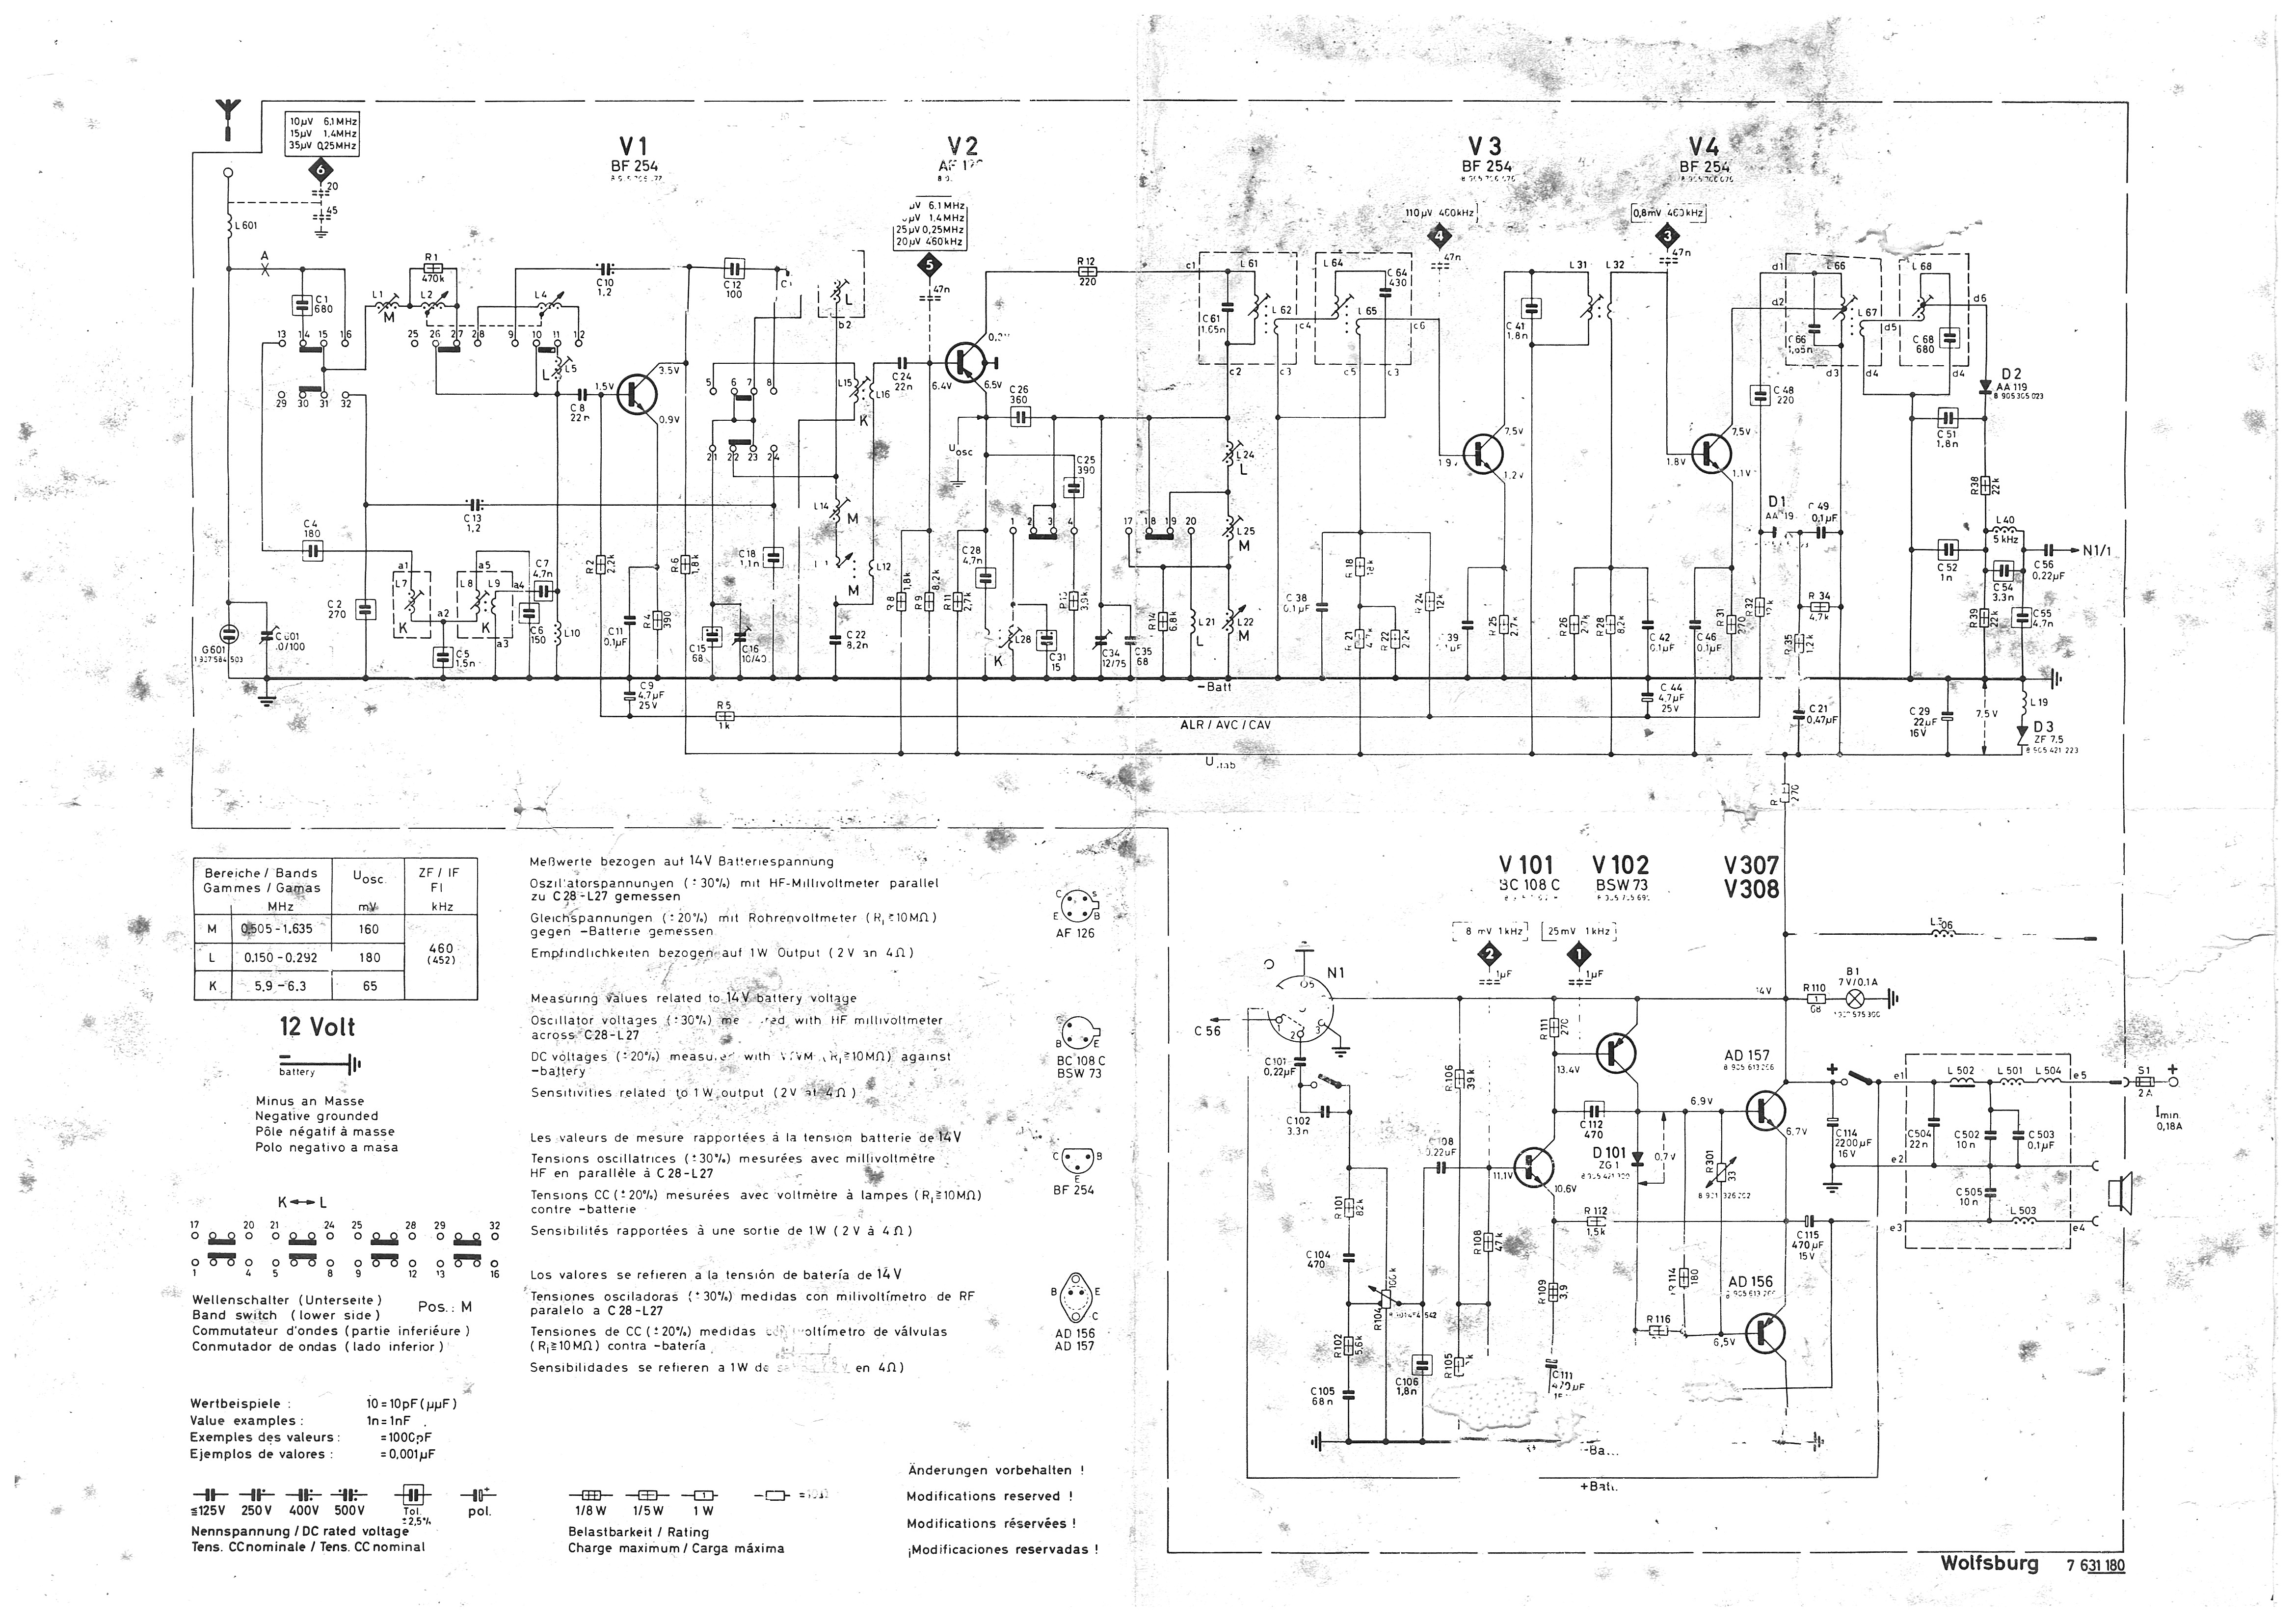 Blaupunkt 568 Wiring Diagram Car Stereo Radio Diagramdesign